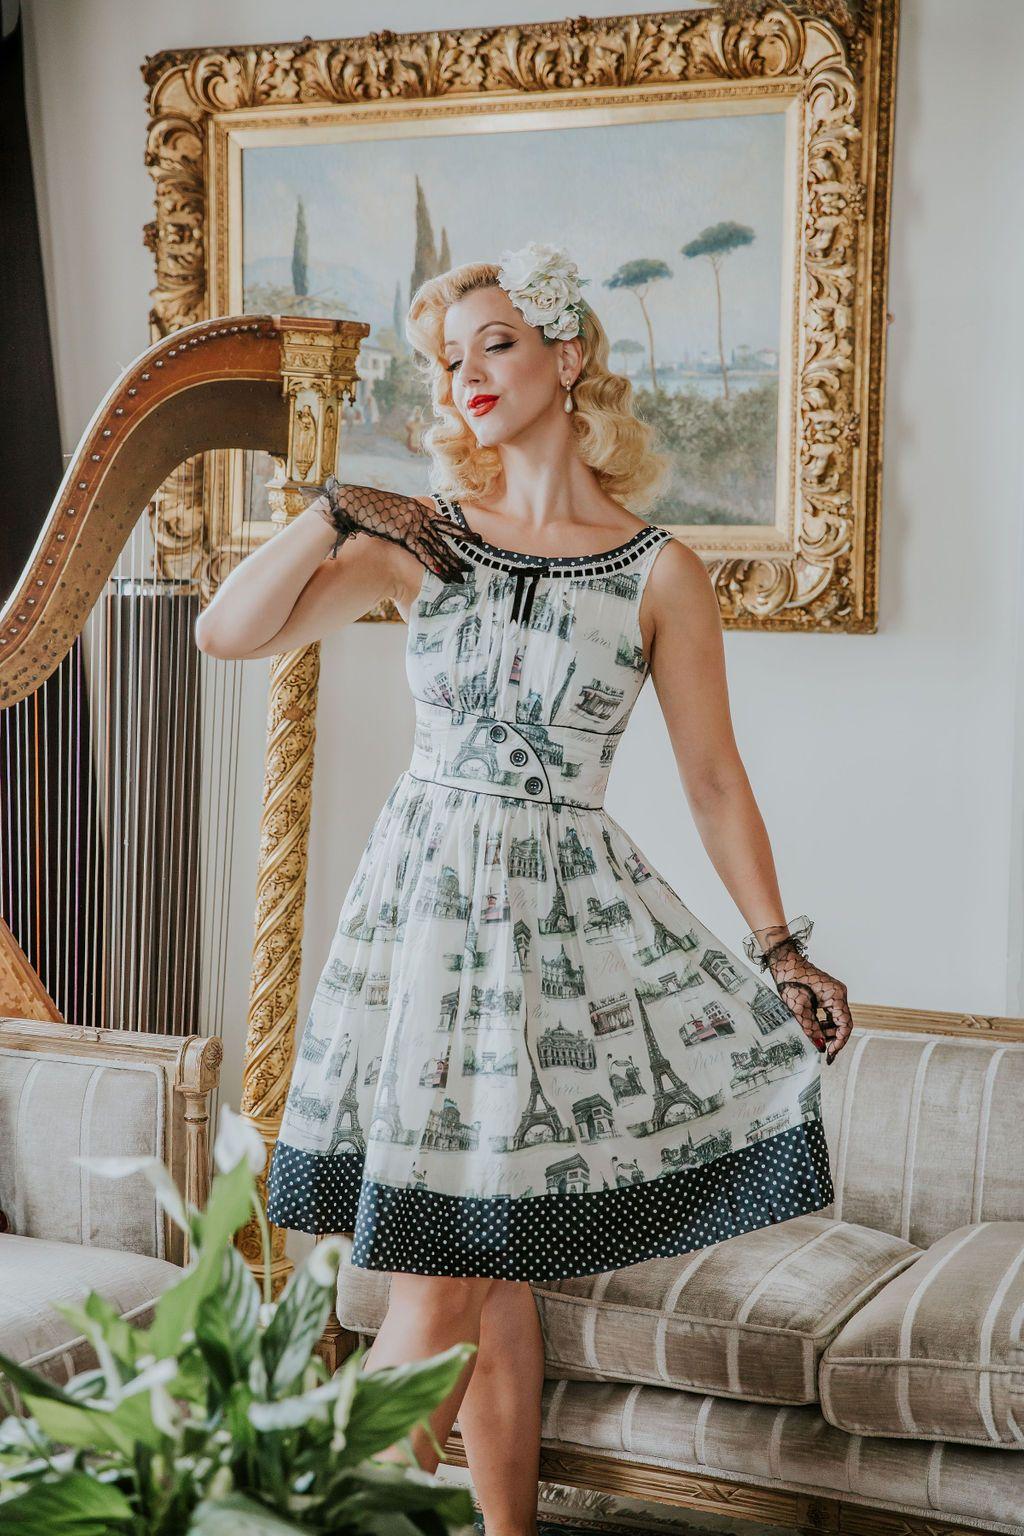 La Parisienne Day Dress Kitten D Amour Miss Victory Violet In 2020 Old Fashion Dresses Day Dresses Dresses